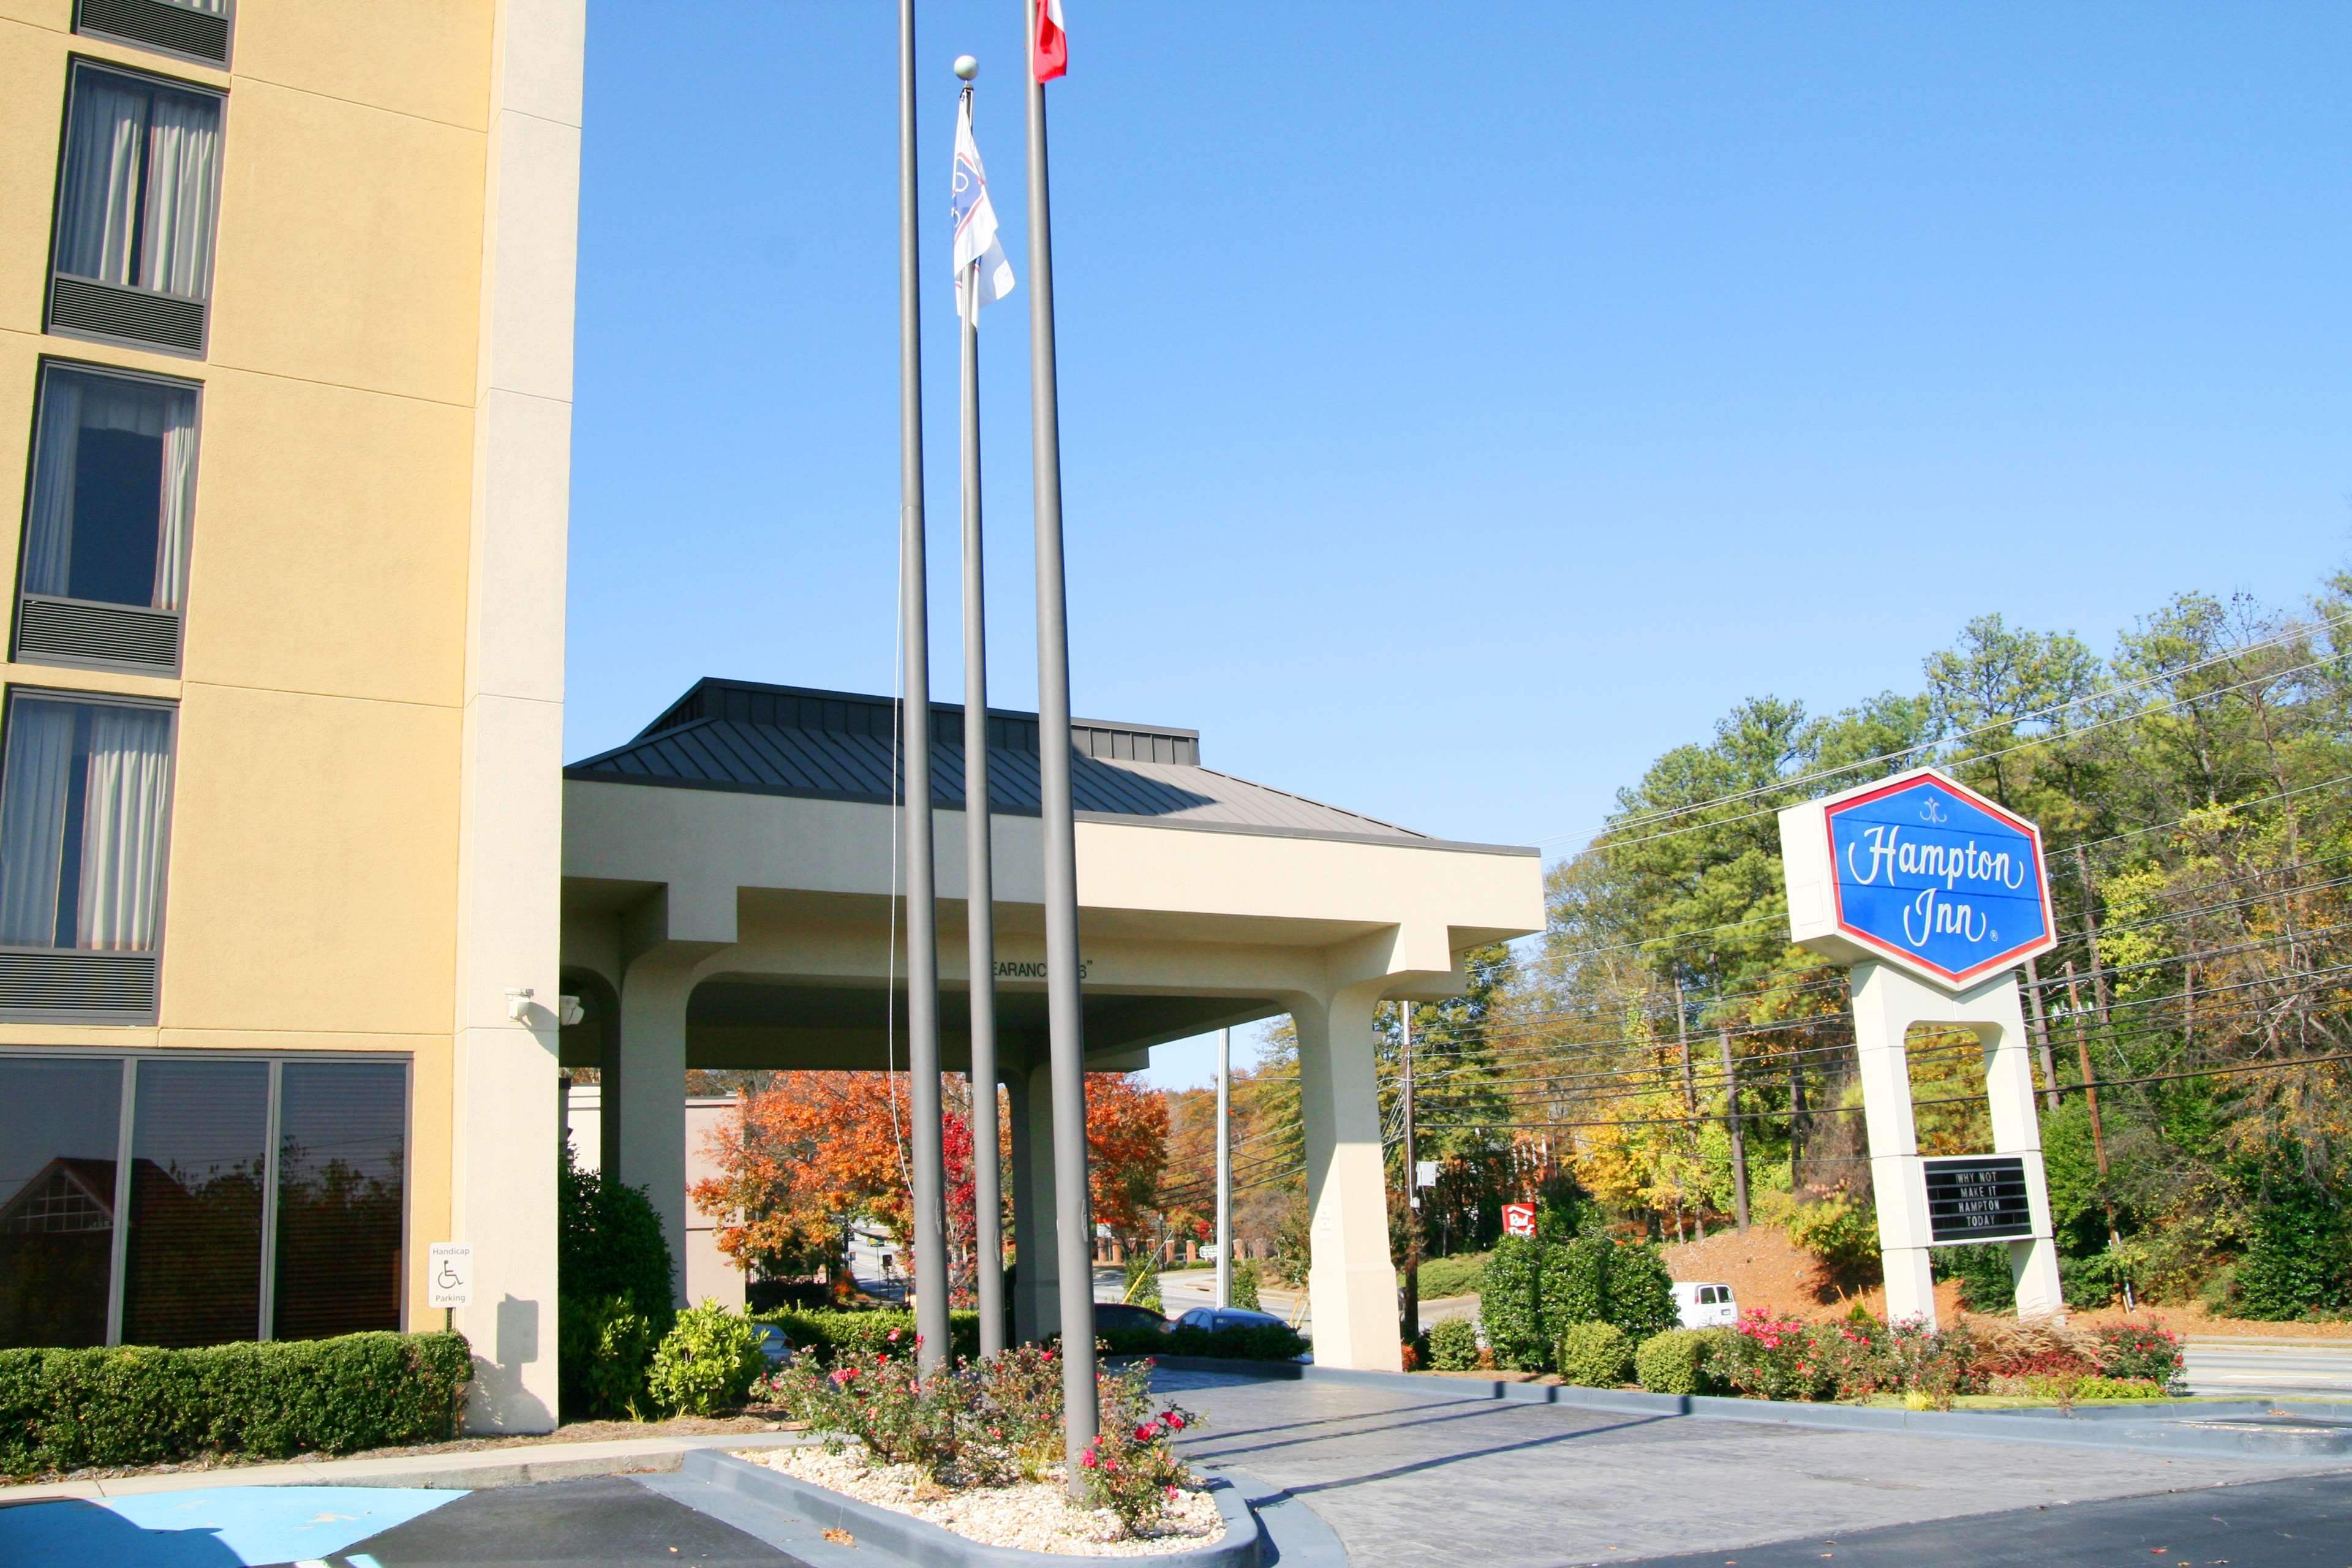 Hampton Inn Atlanta-North Druid Hills image 1